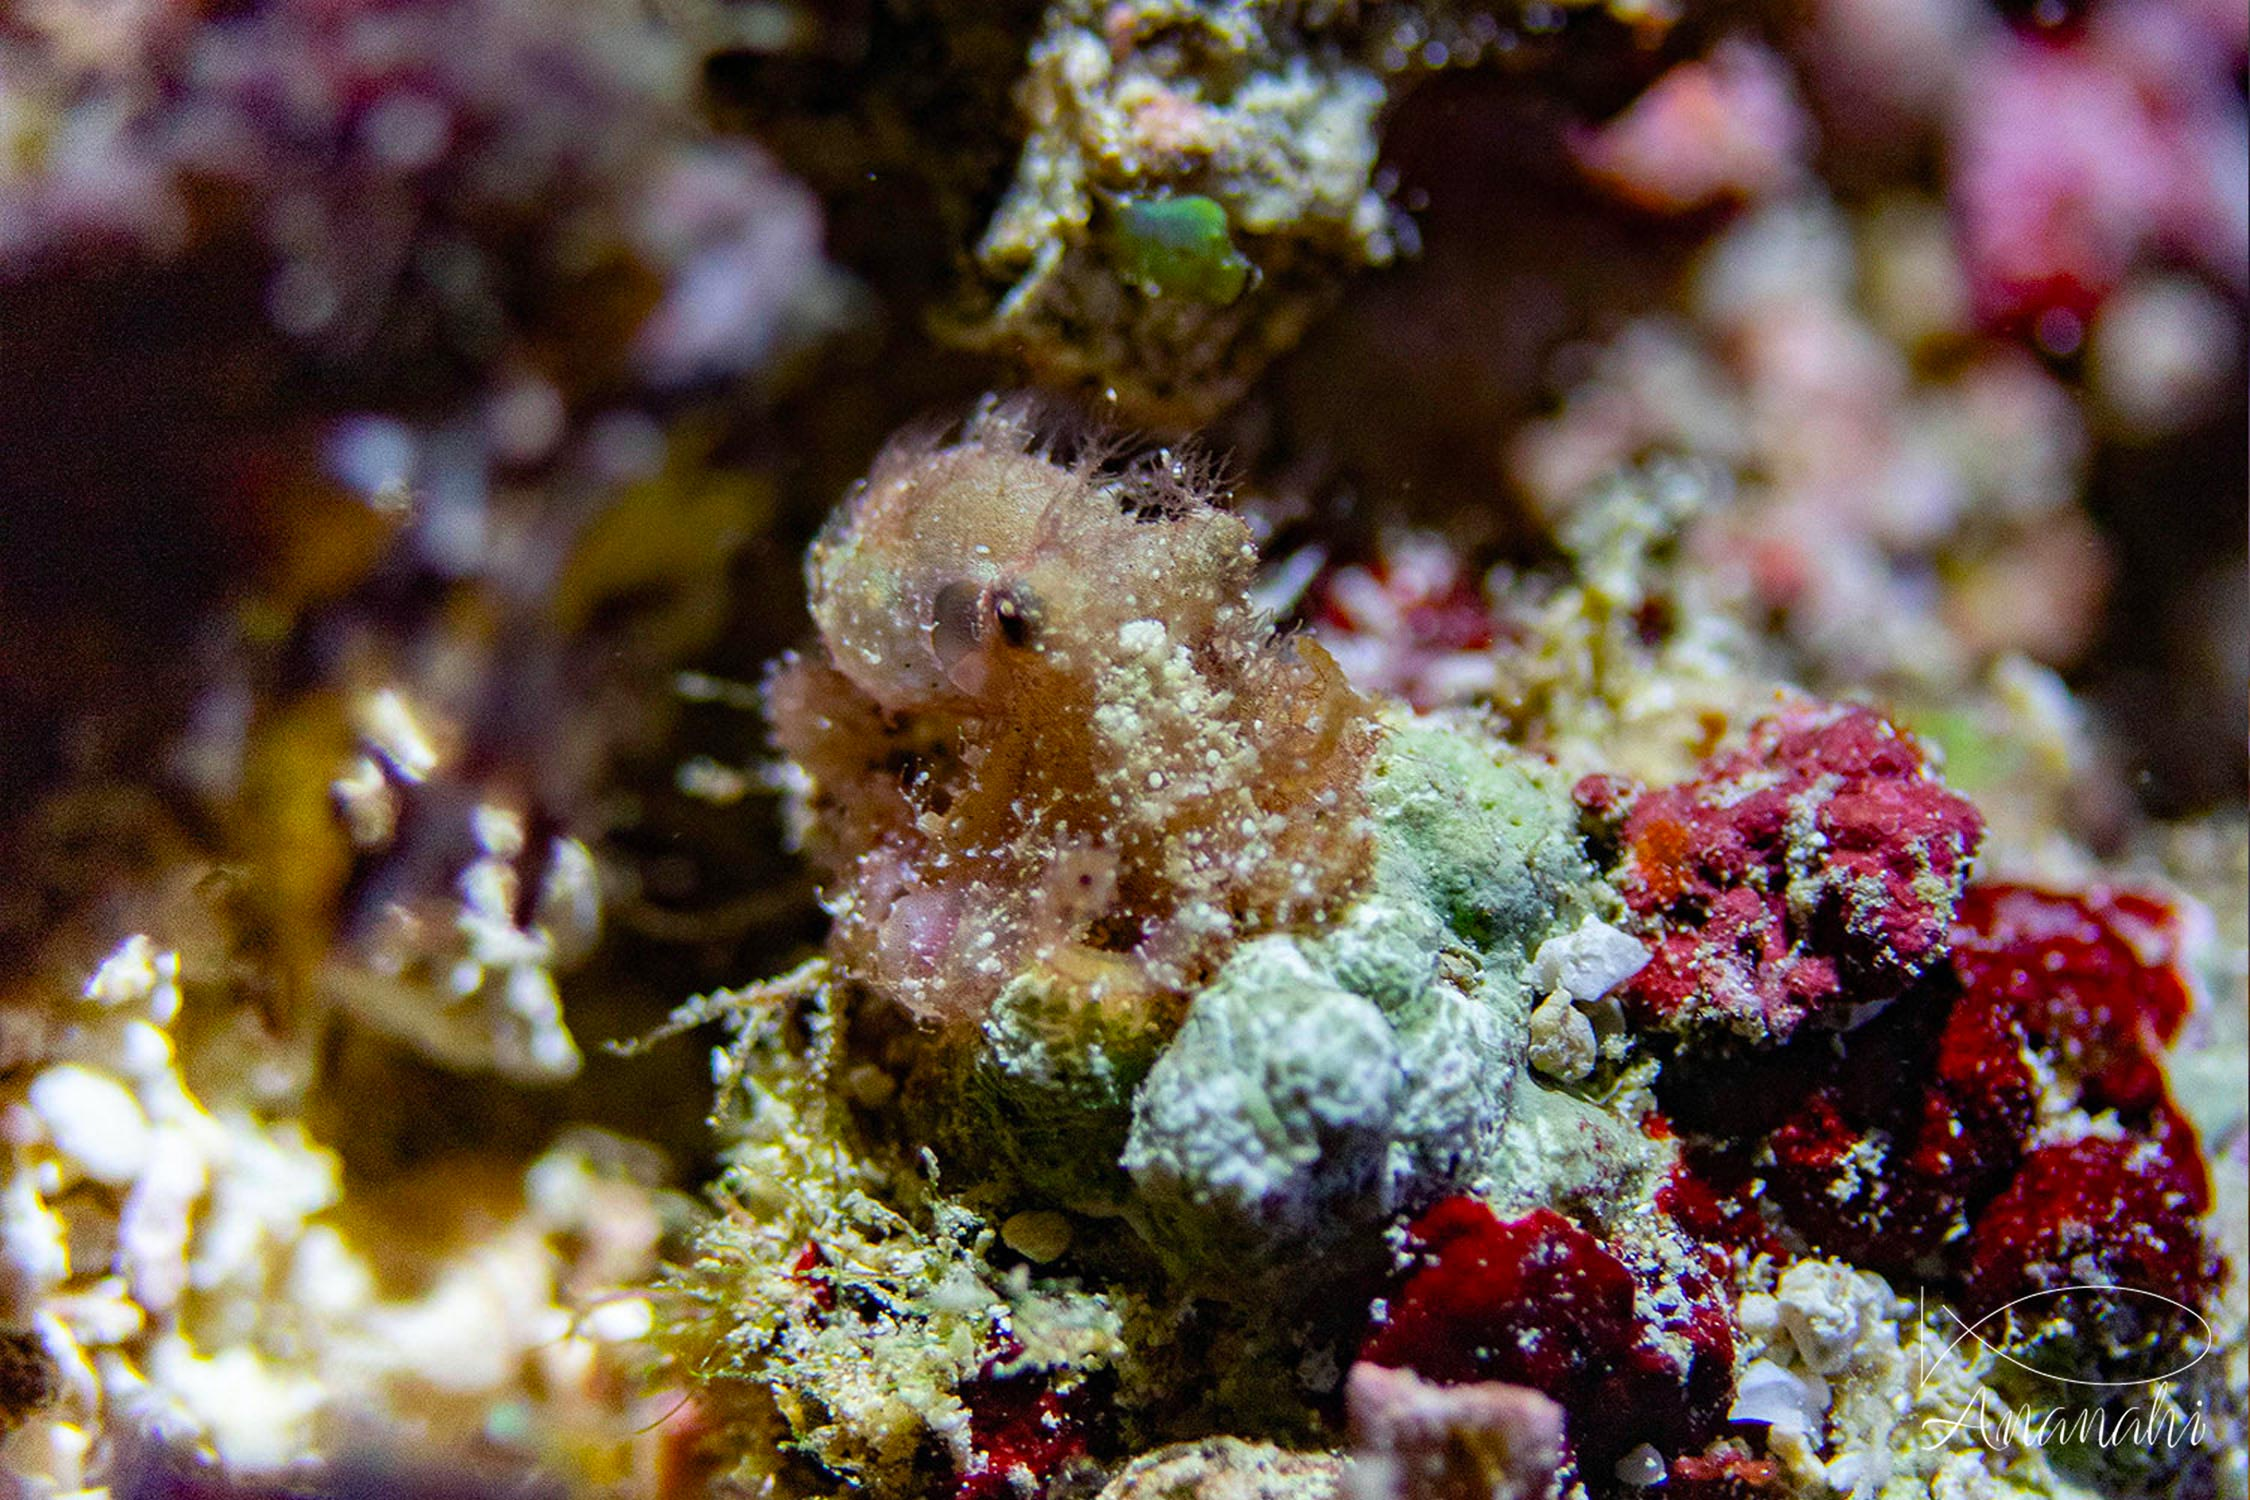 Hairy octopus of Raja Ampat